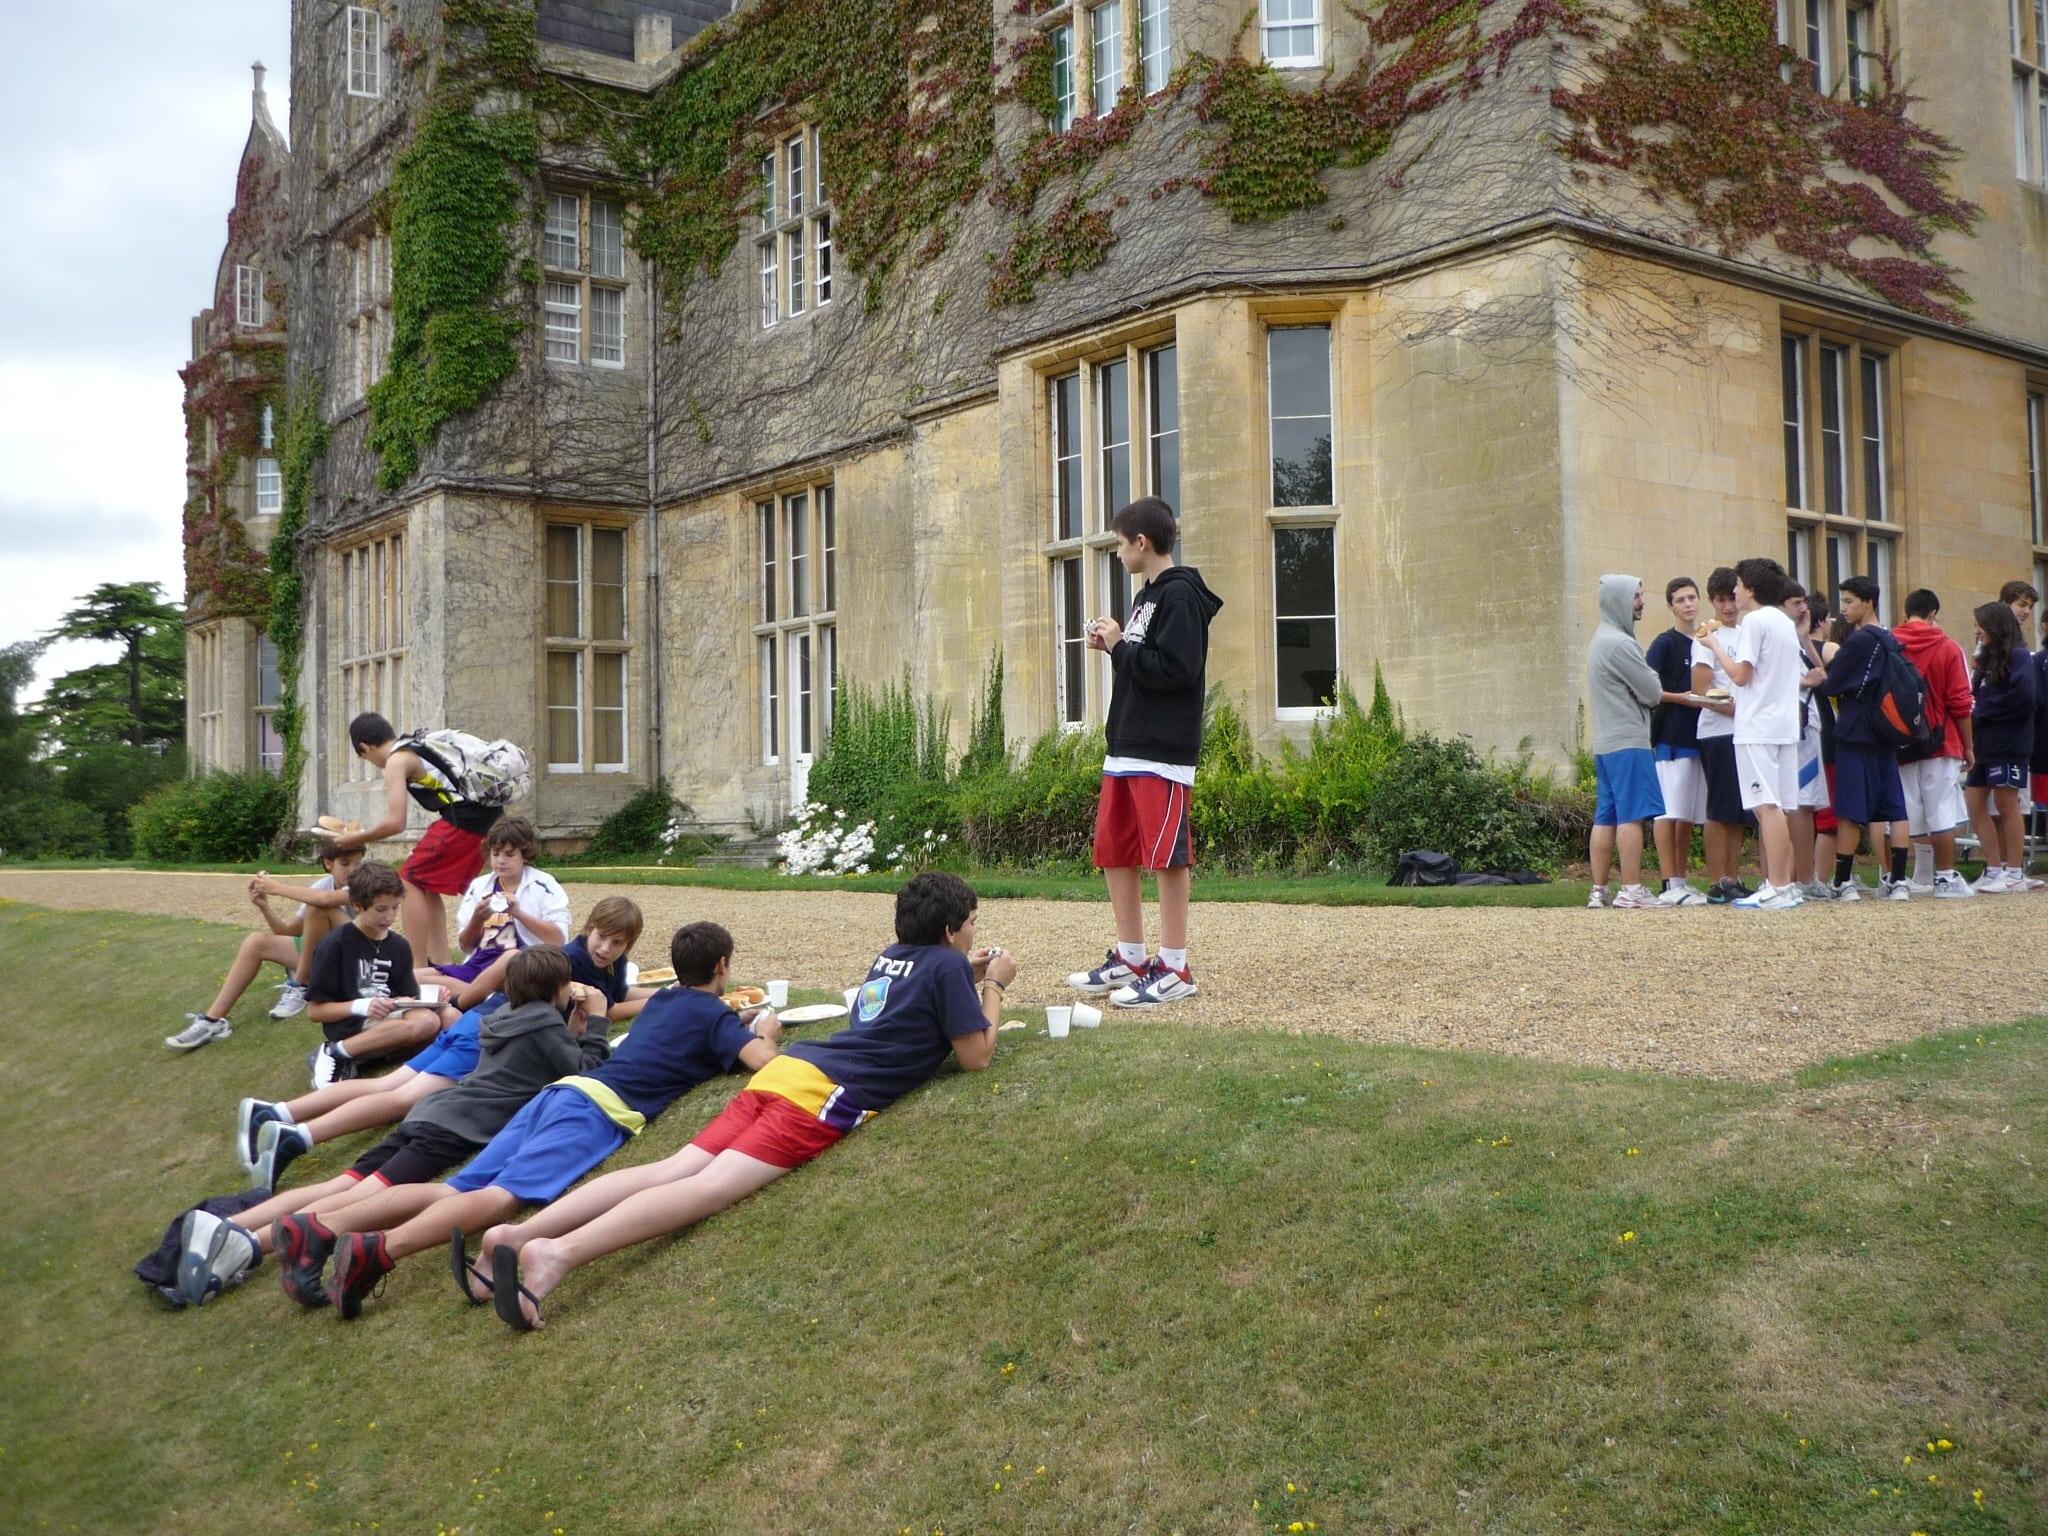 Blog from England: Se acaba la aventura